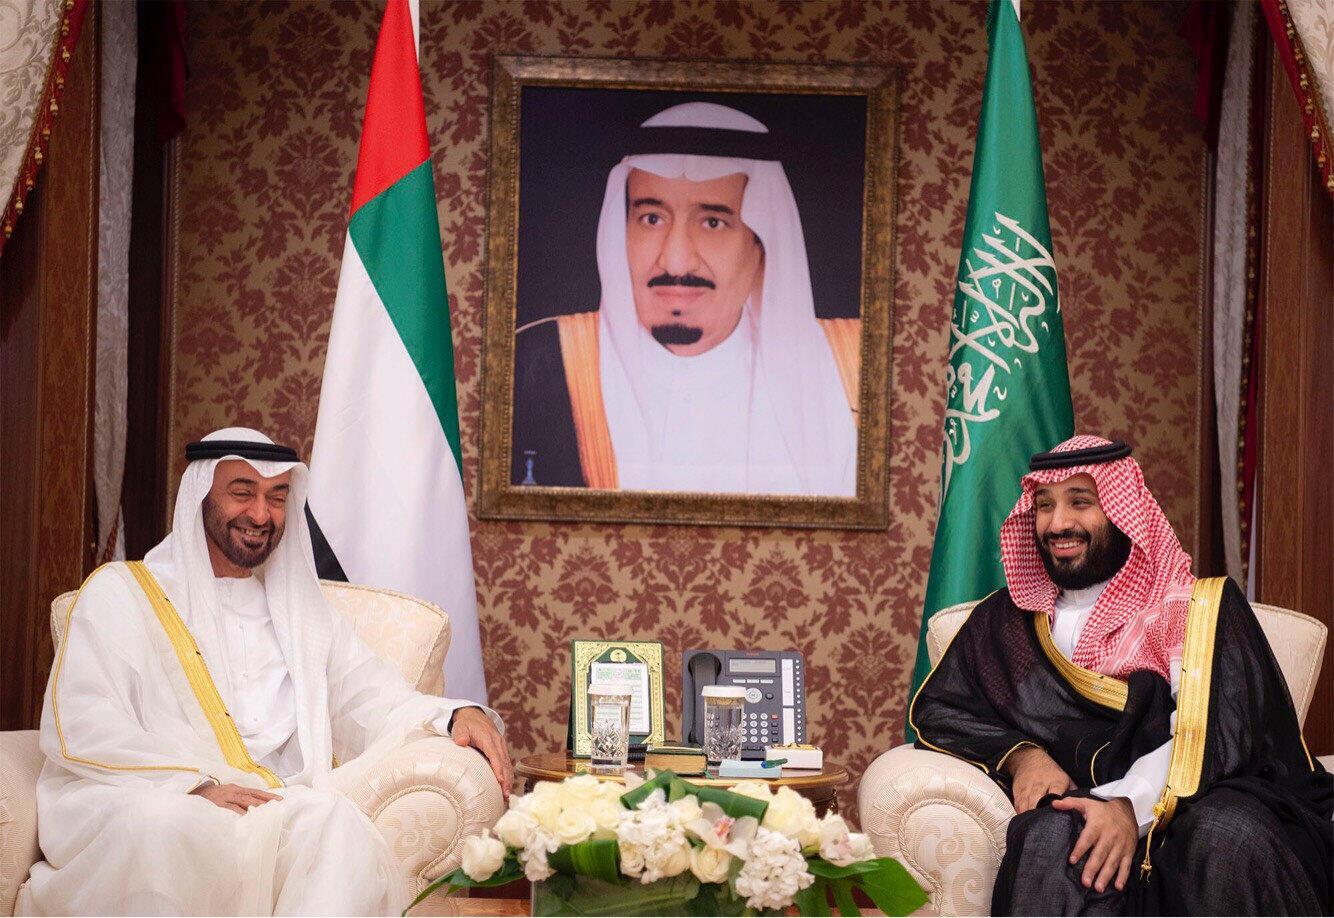 Abu Dhabi's Crown Prince Sheikh Mohammed bin Zayed al-Nahyan meets with Saudi Crown Prince Mohammed bin Salman during the Saudi-UAE Summit in Jeddah, Saudi Arabia, June 6, 2018.